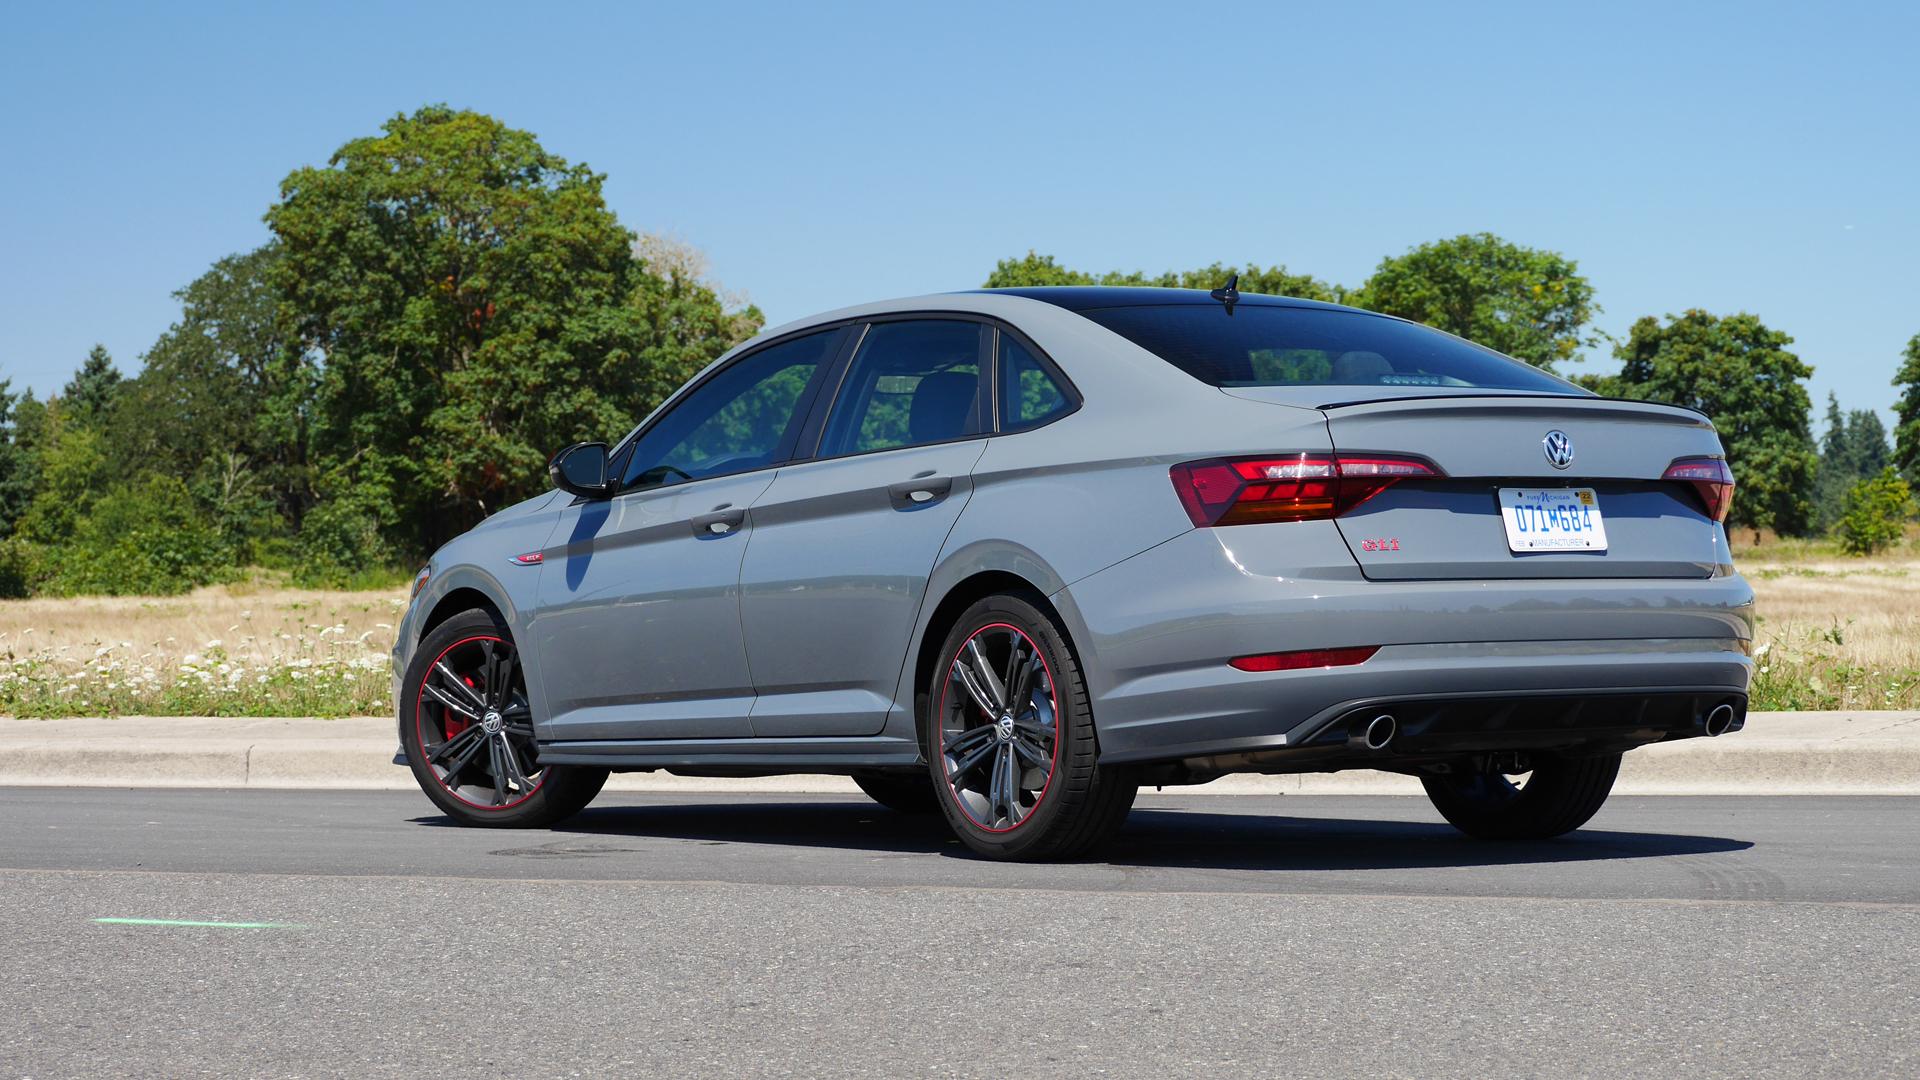 2020 Volkswagen Jetta Reviews | Price, specs, features and ...